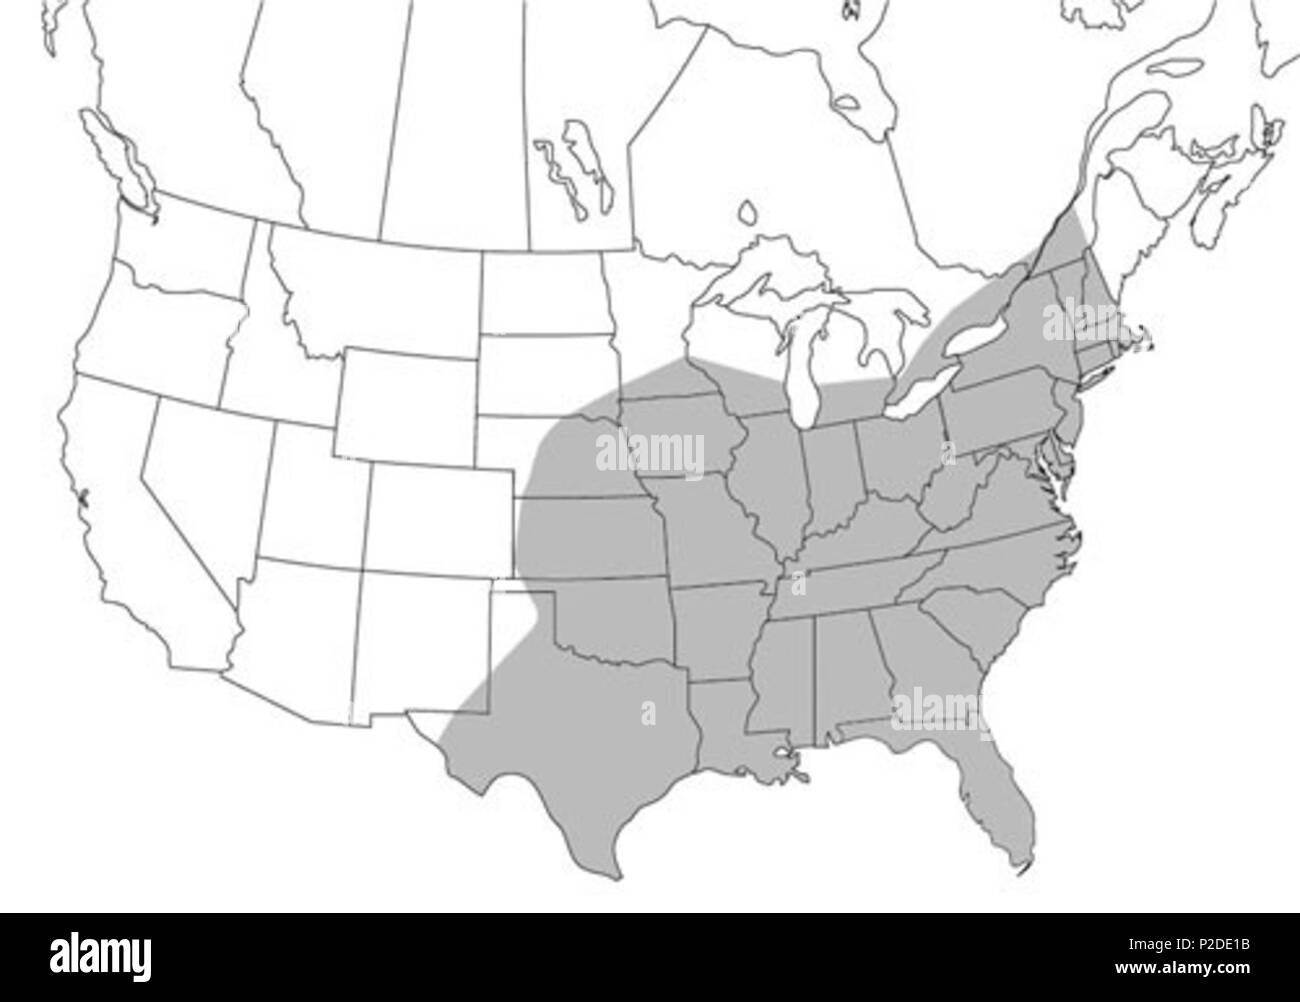 University Of Florida Map.English The North American Range Of The Psorophora Ciliata Mosquito